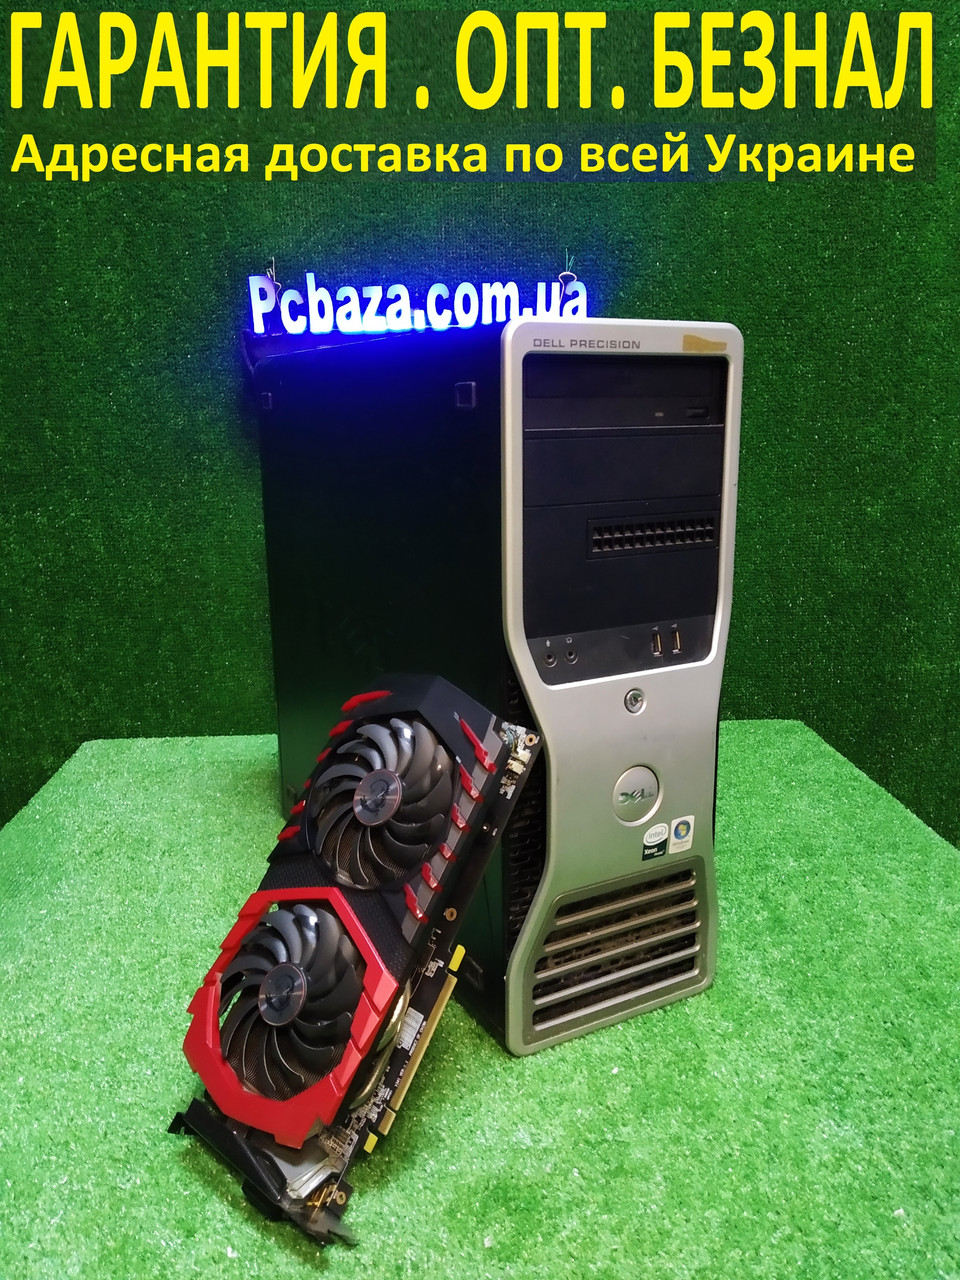 Игровой Настроенный Dell Precision t3500, 6(12) ядер, Core i7 (Xeon) 12gb ОЗУ, 128SSD+500GB HDD, RX 470 4GB